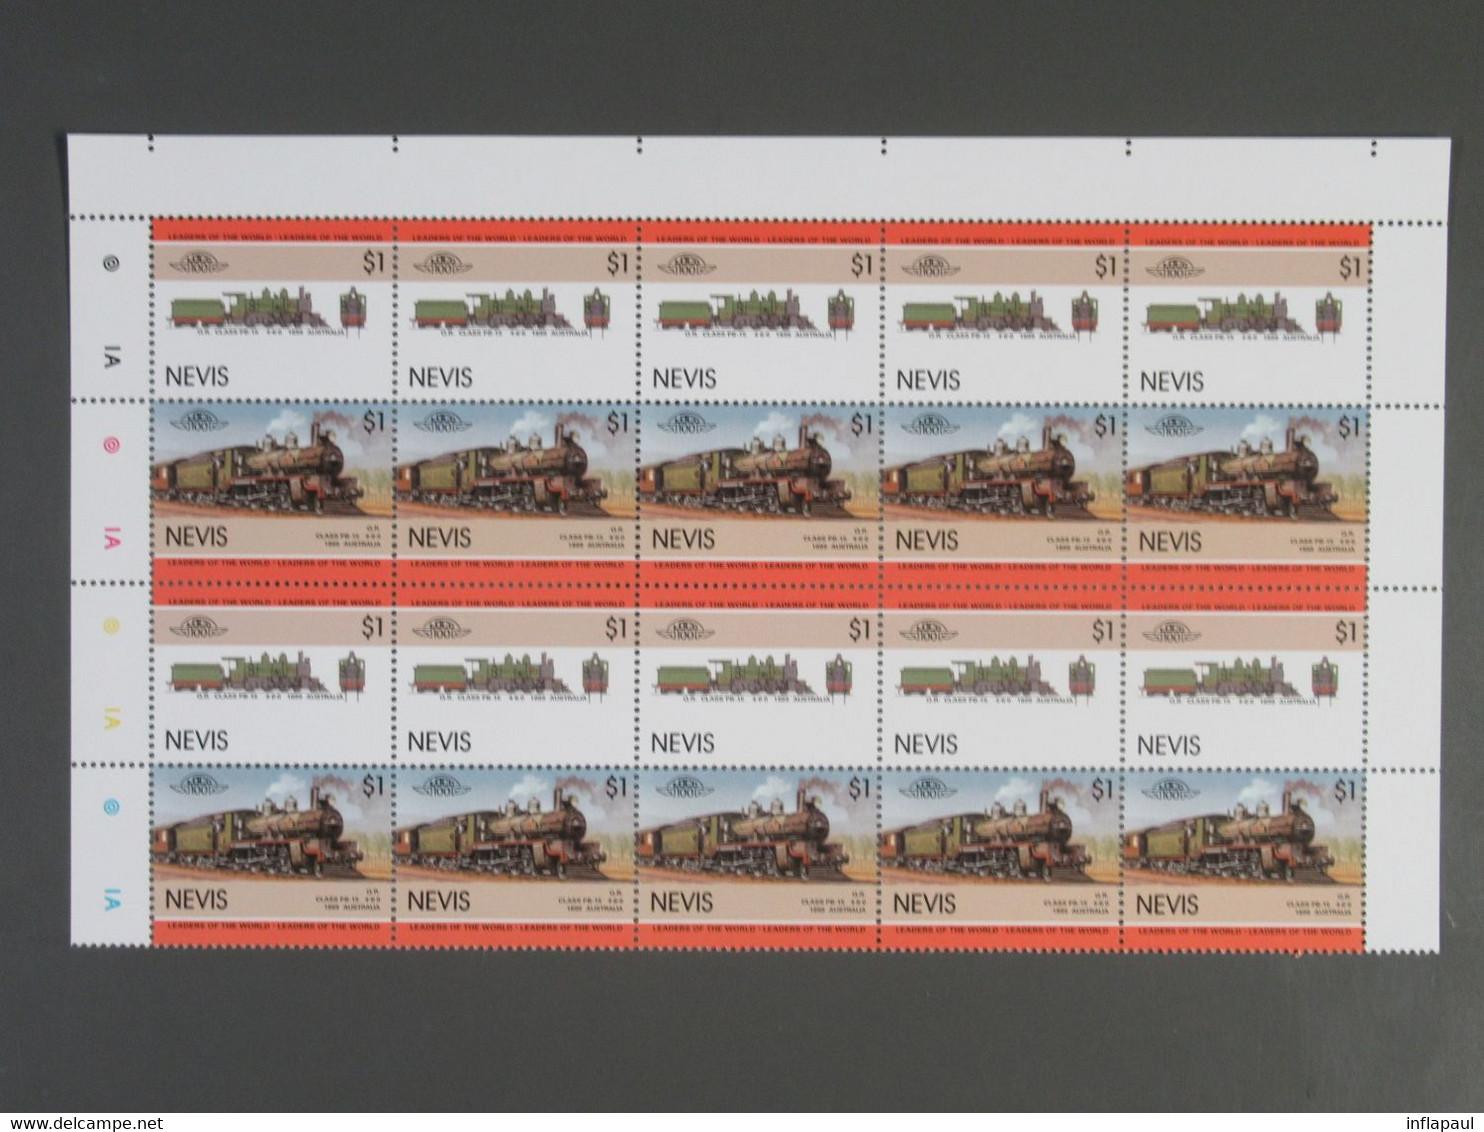 Karibik Nur Komplette Serien Per 10  - Karibik Only Complete Per 10 800,00 € Michelwert - Collezioni (senza Album)